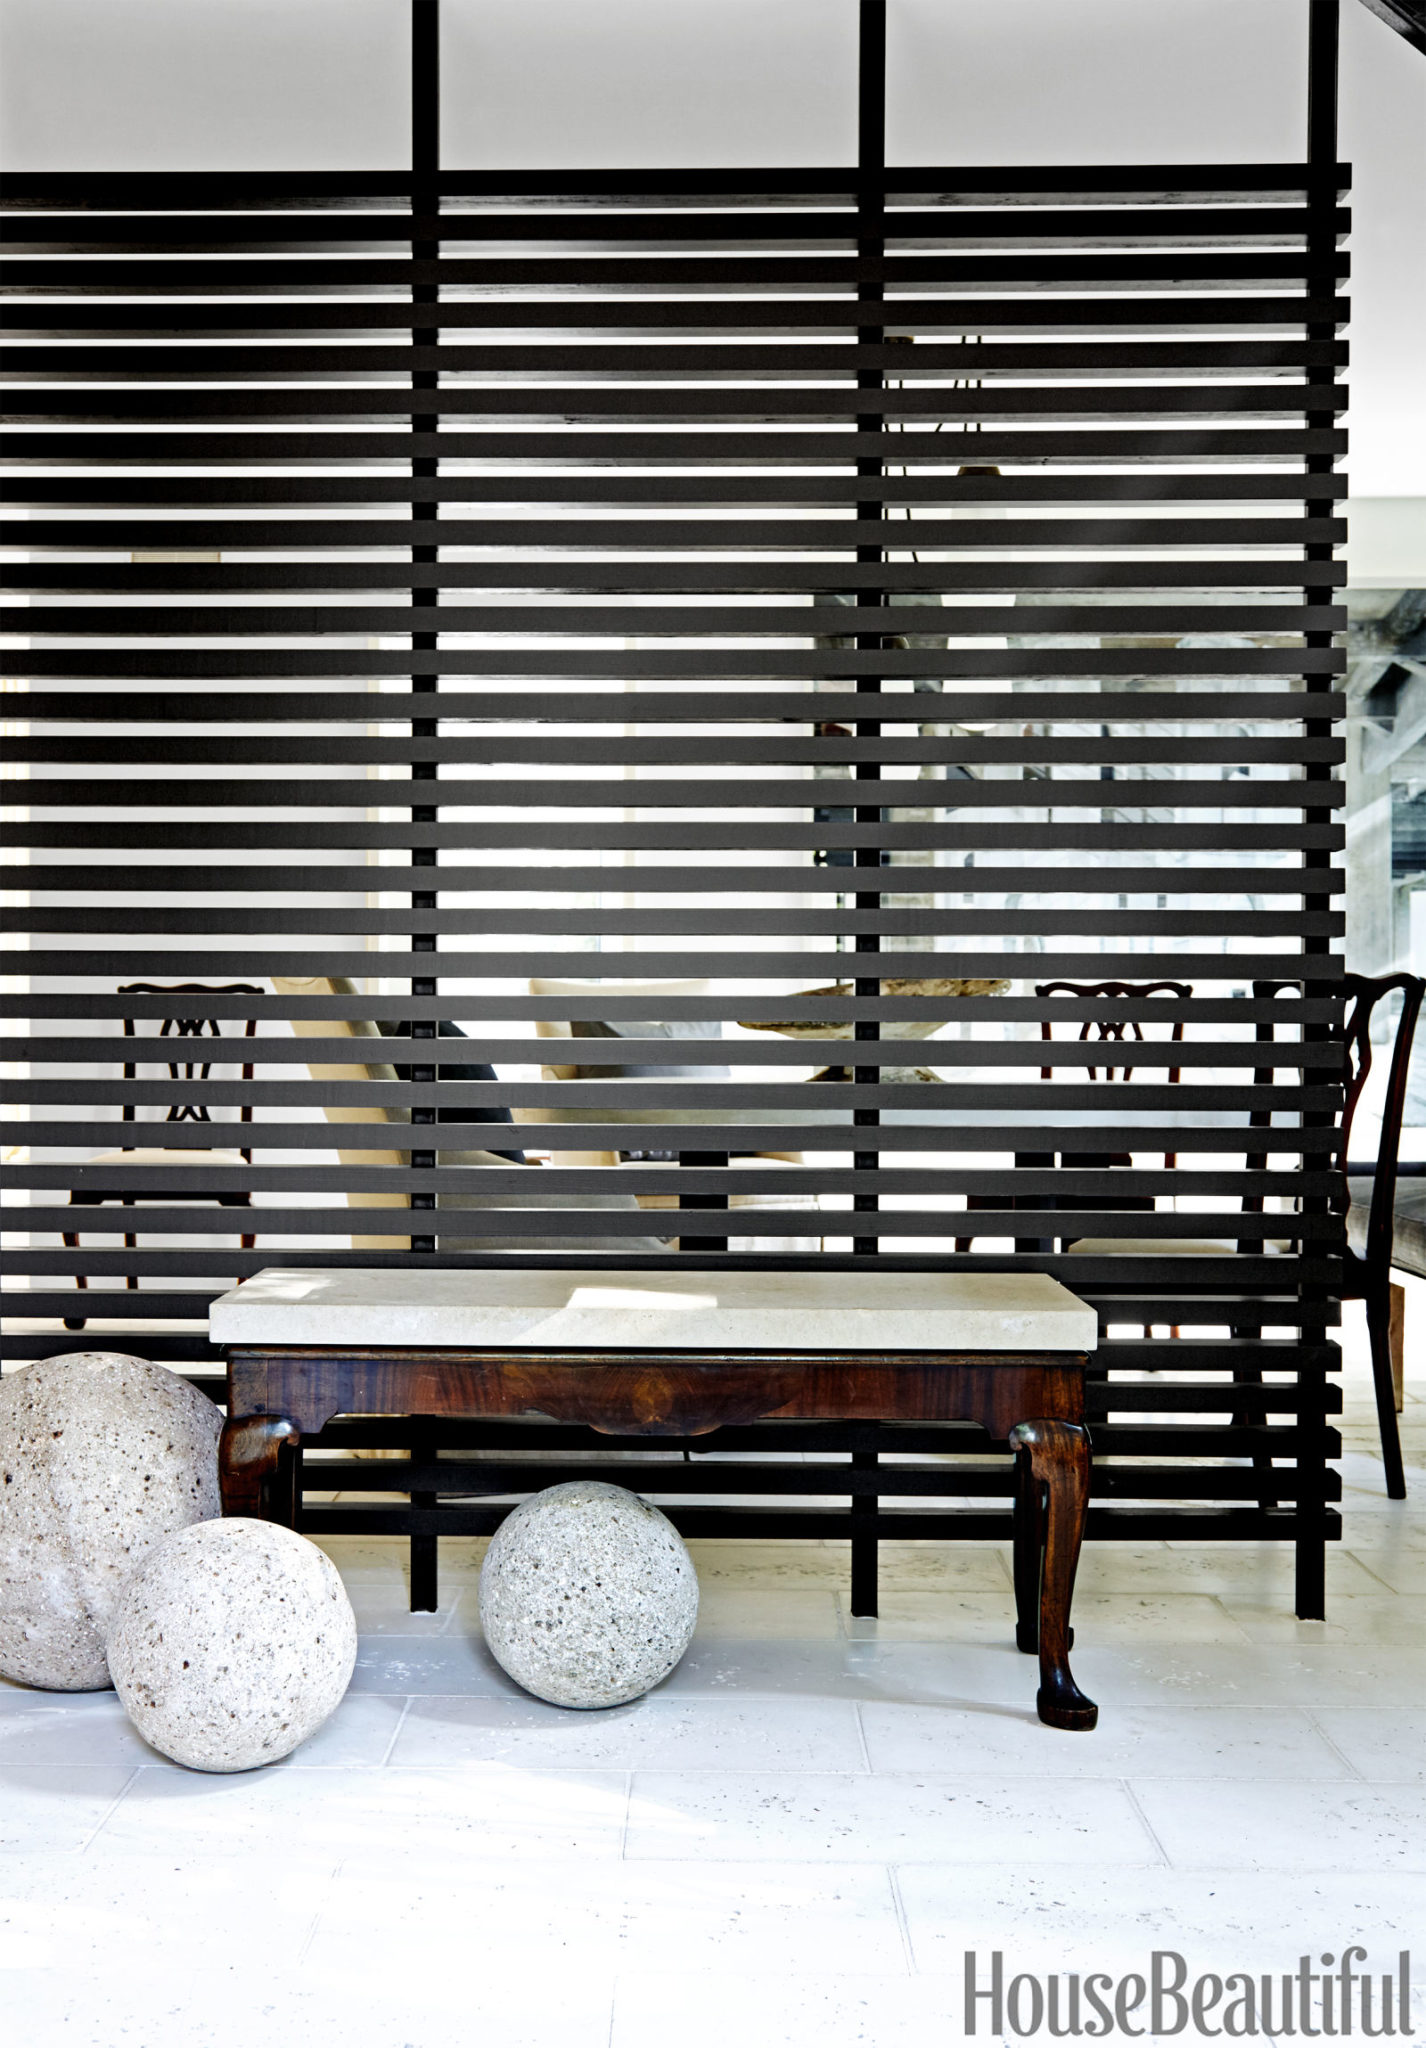 Foyer Minimalist Art : Ditch the clutter minimalist entryways